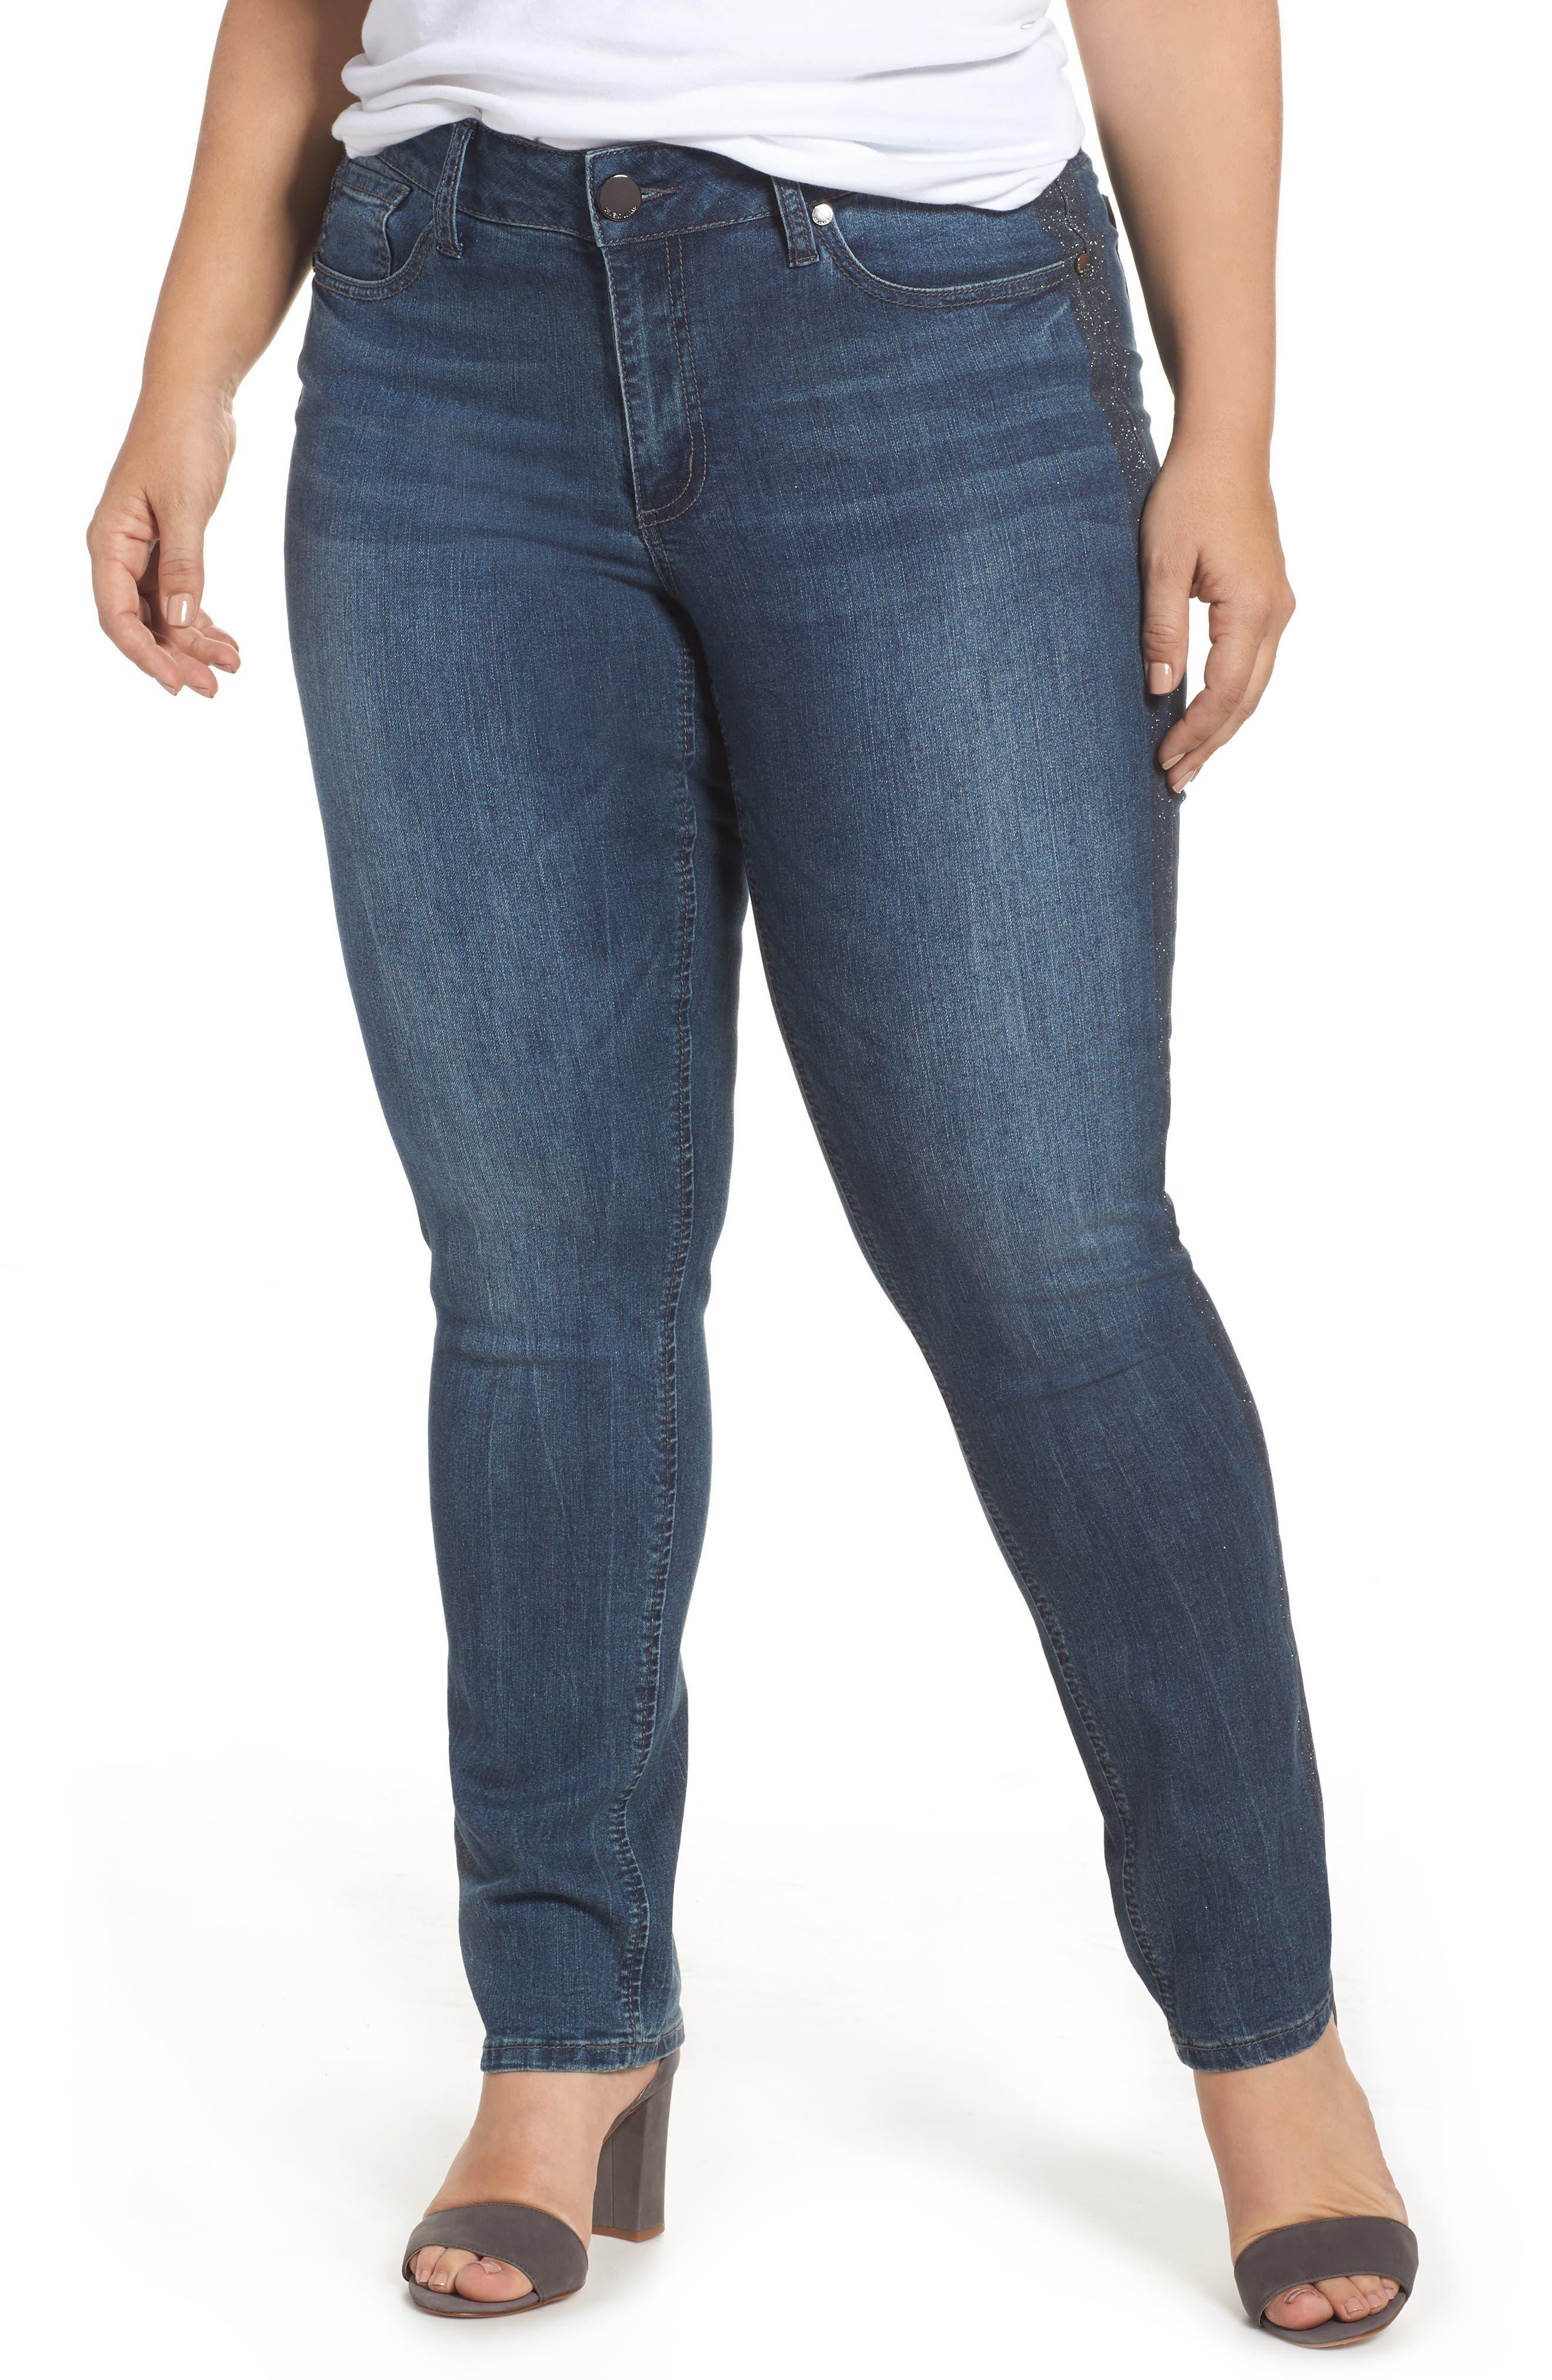 Alternate Image 1 Selected - Seven7 Printed Foil Tuxedo Stripe Skinny Jeans (Locke) (Plus Size)